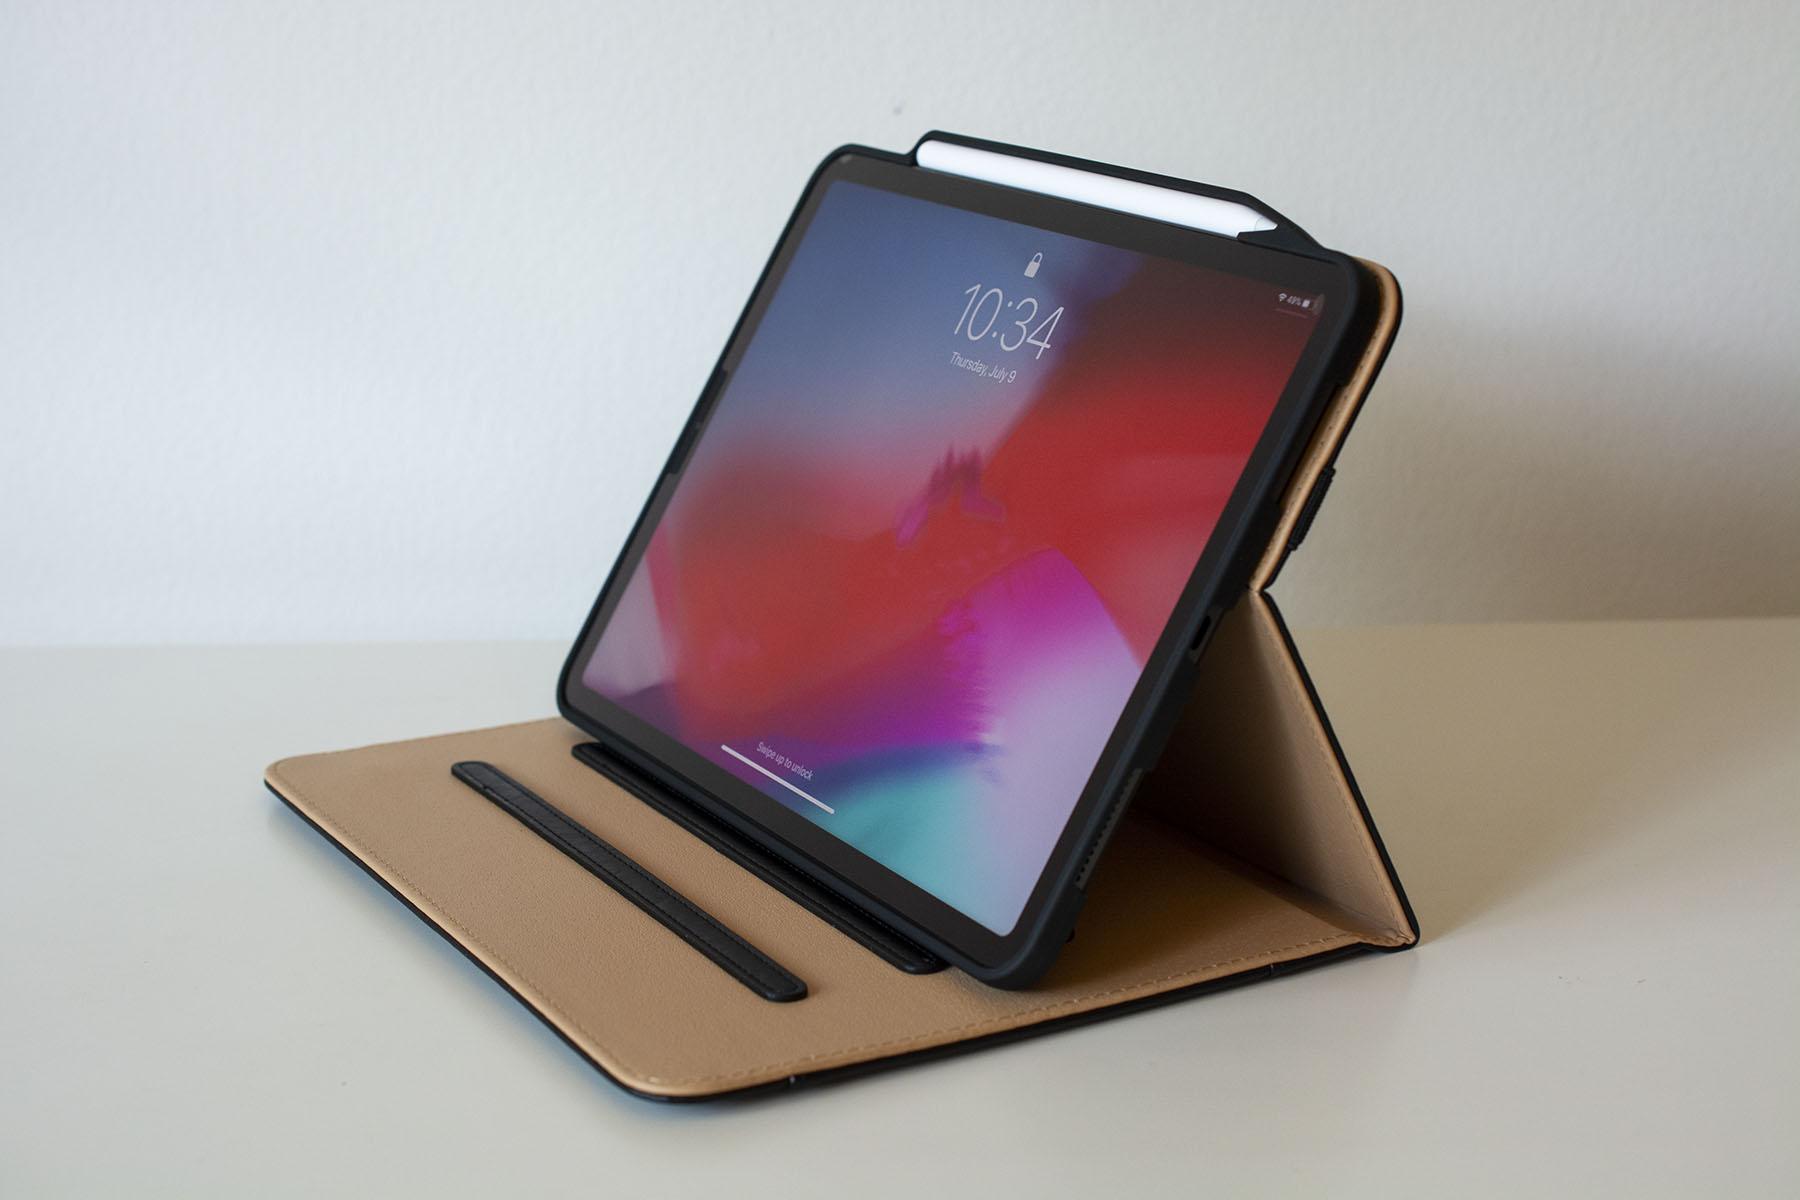 ProCase Leather Folio case for iPad Pro